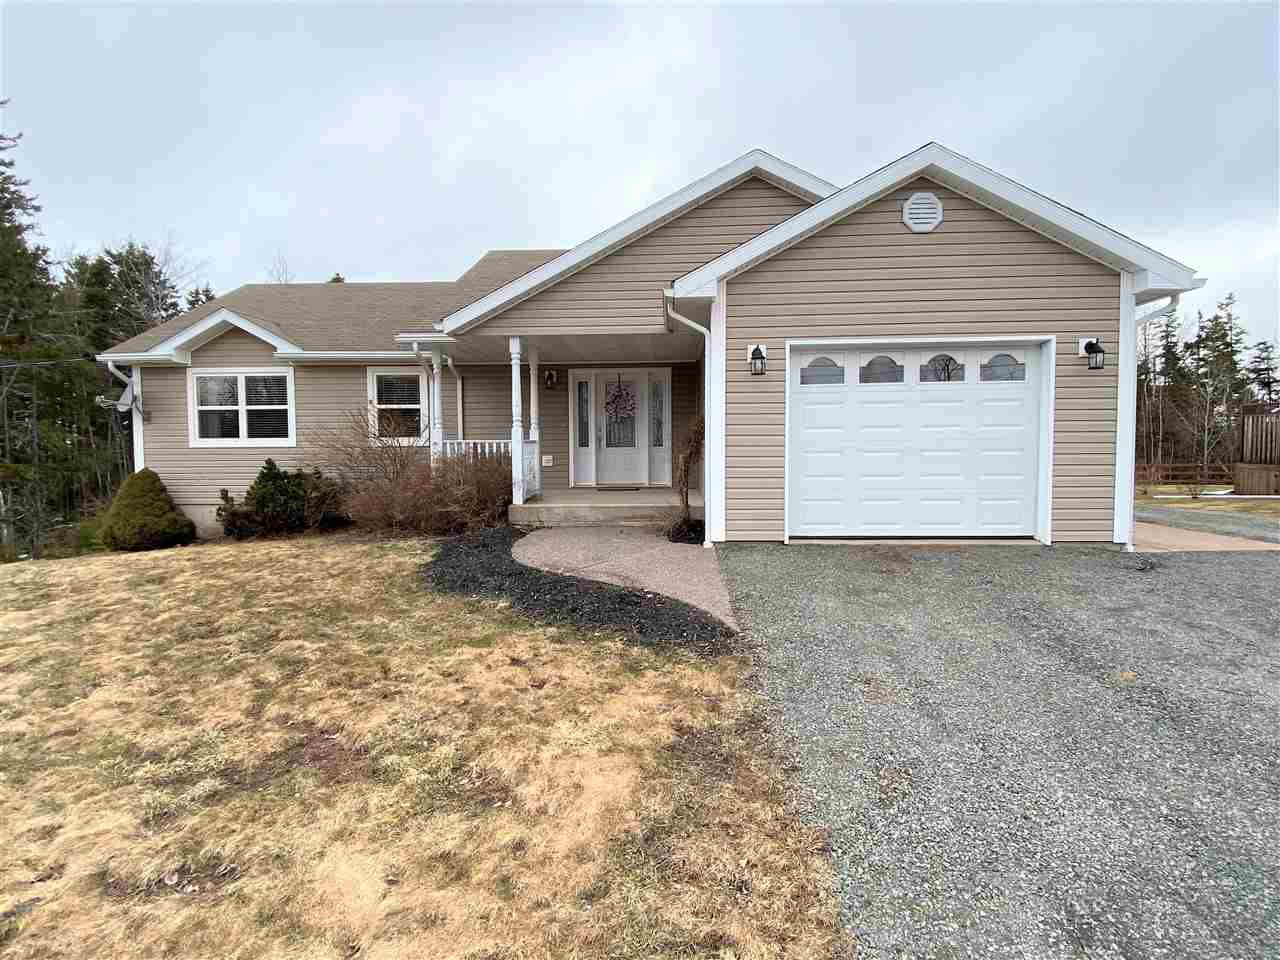 Main Photo: 2508 Spring Garden Road in Westville: 107-Trenton,Westville,Pictou Residential for sale (Northern Region)  : MLS®# 202005887